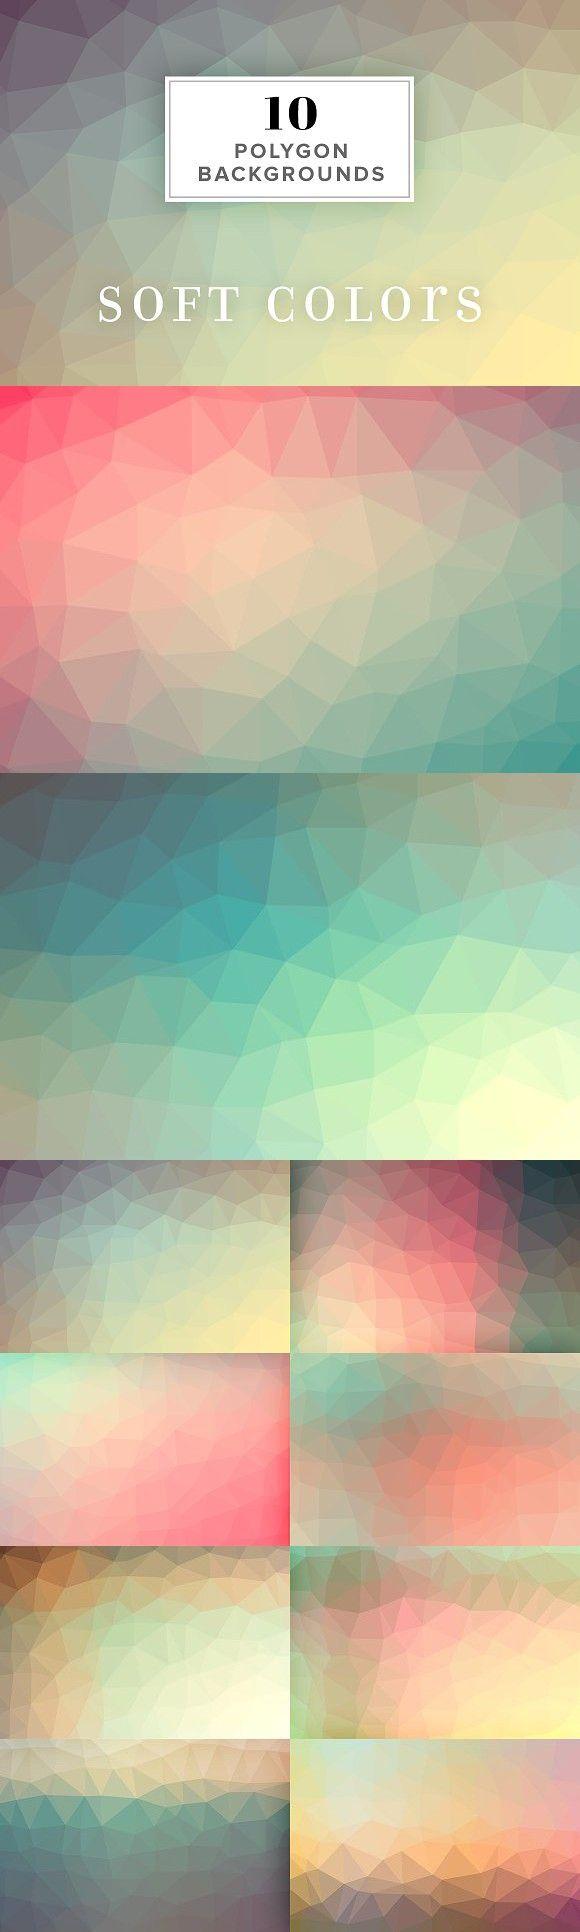 Website soft colors - 10 Polygon Backgrounds Soft Colors